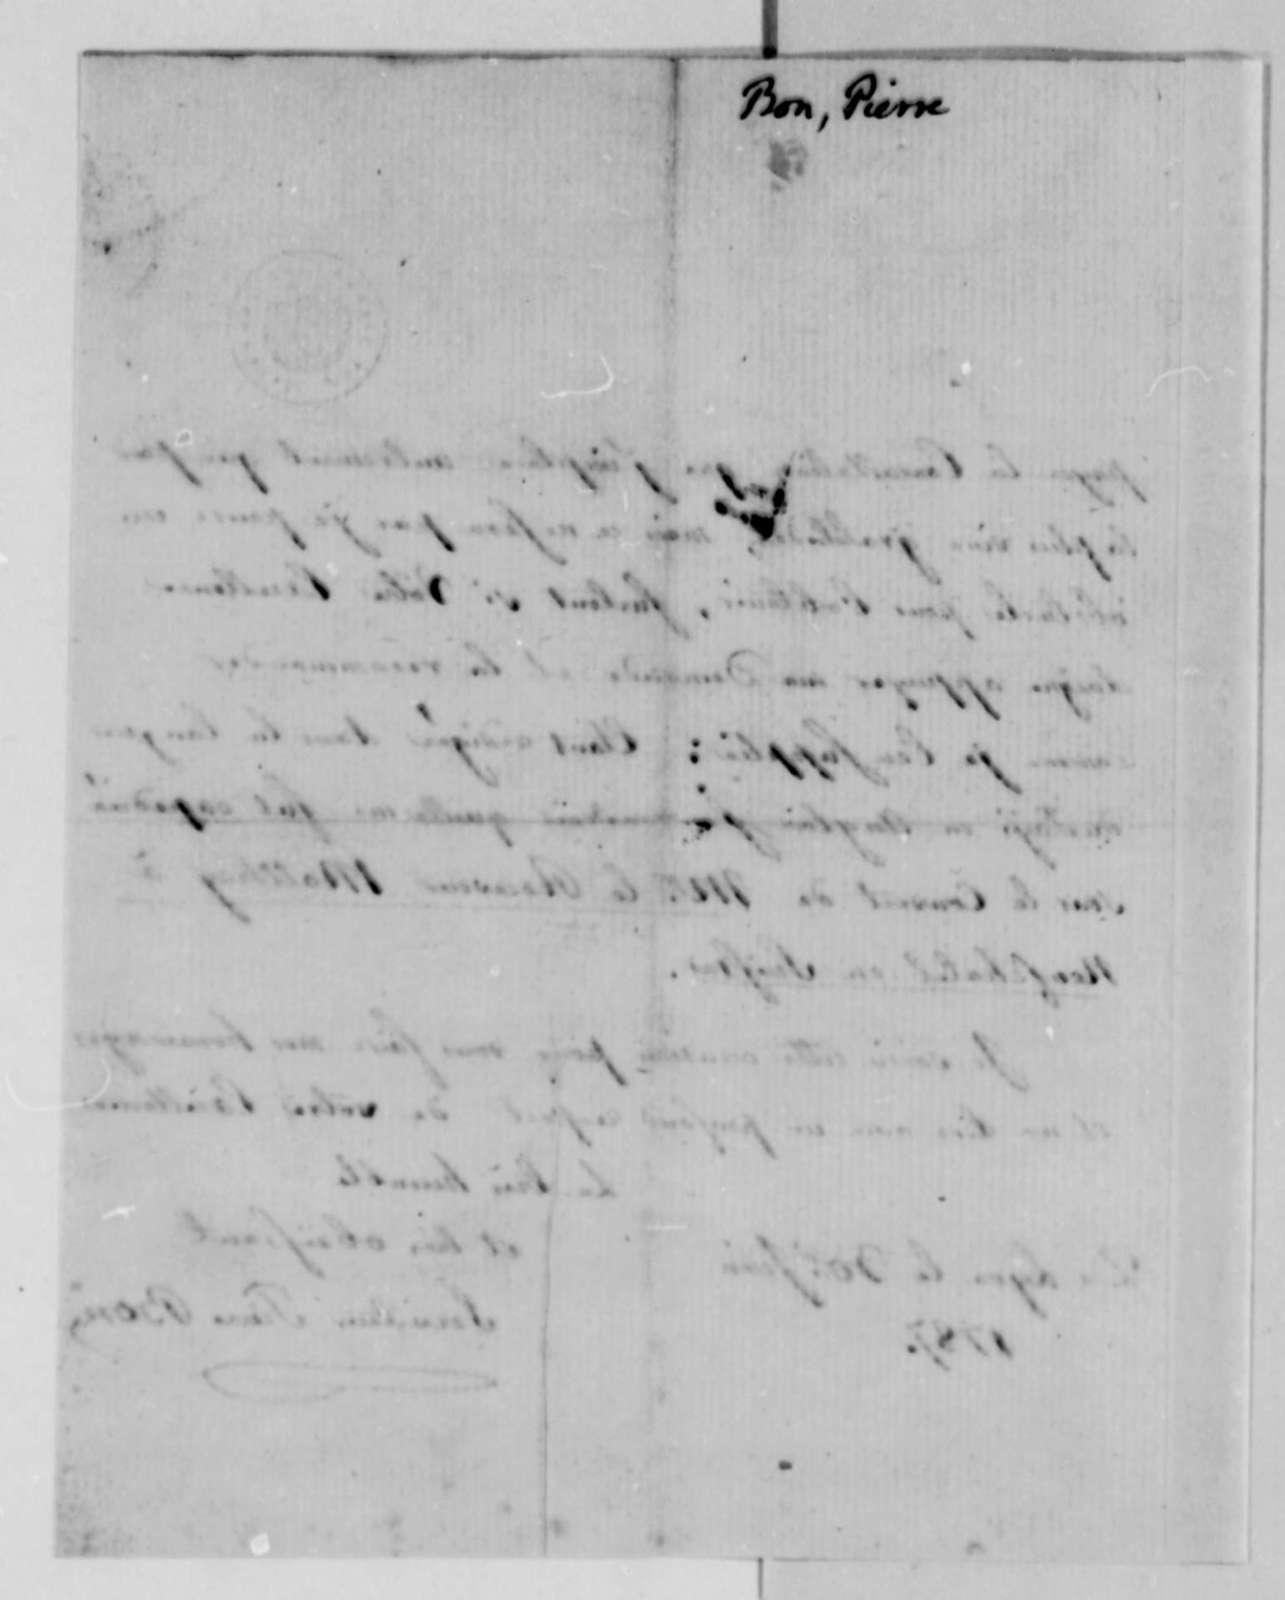 Pierre Bon to Thomas Jefferson, June 30, 1787, in French